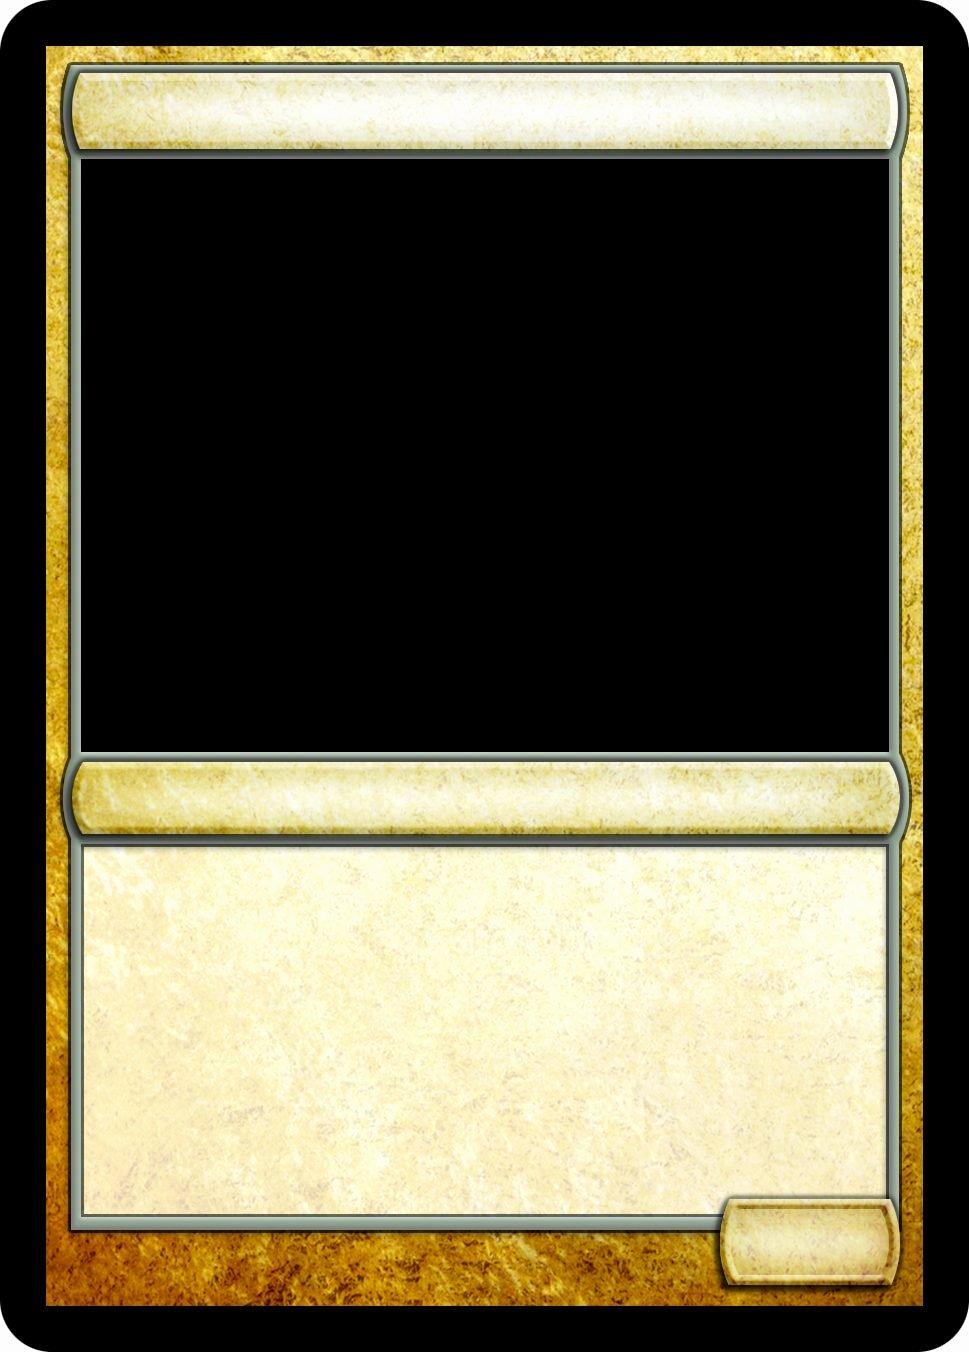 Trading Card Template Photoshop Luxury Magic Trading Card Template